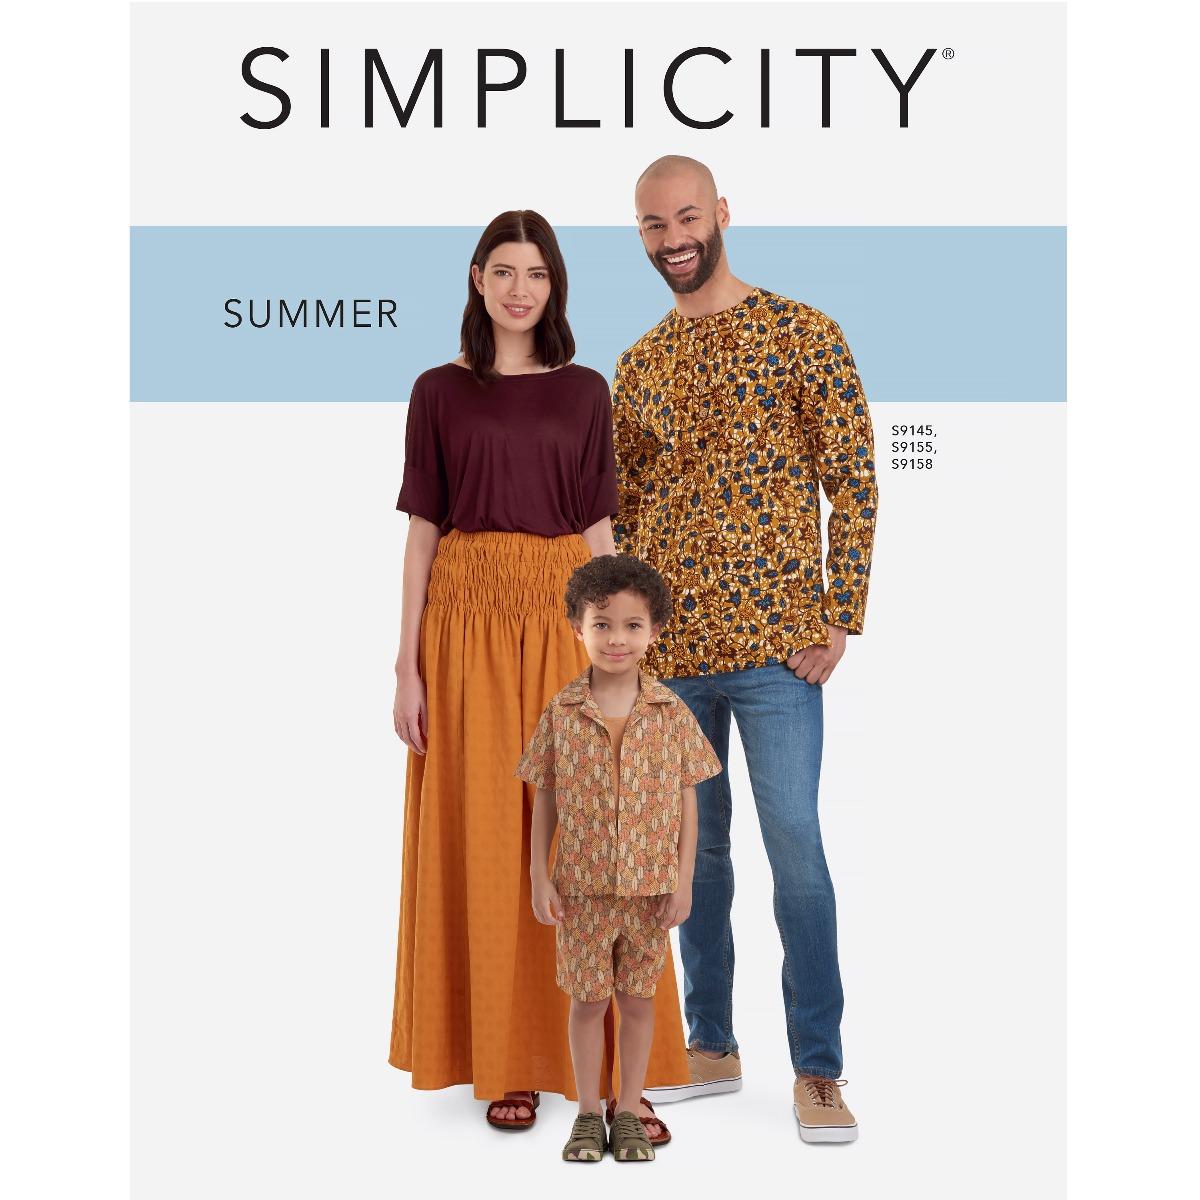 Simplicity sommar